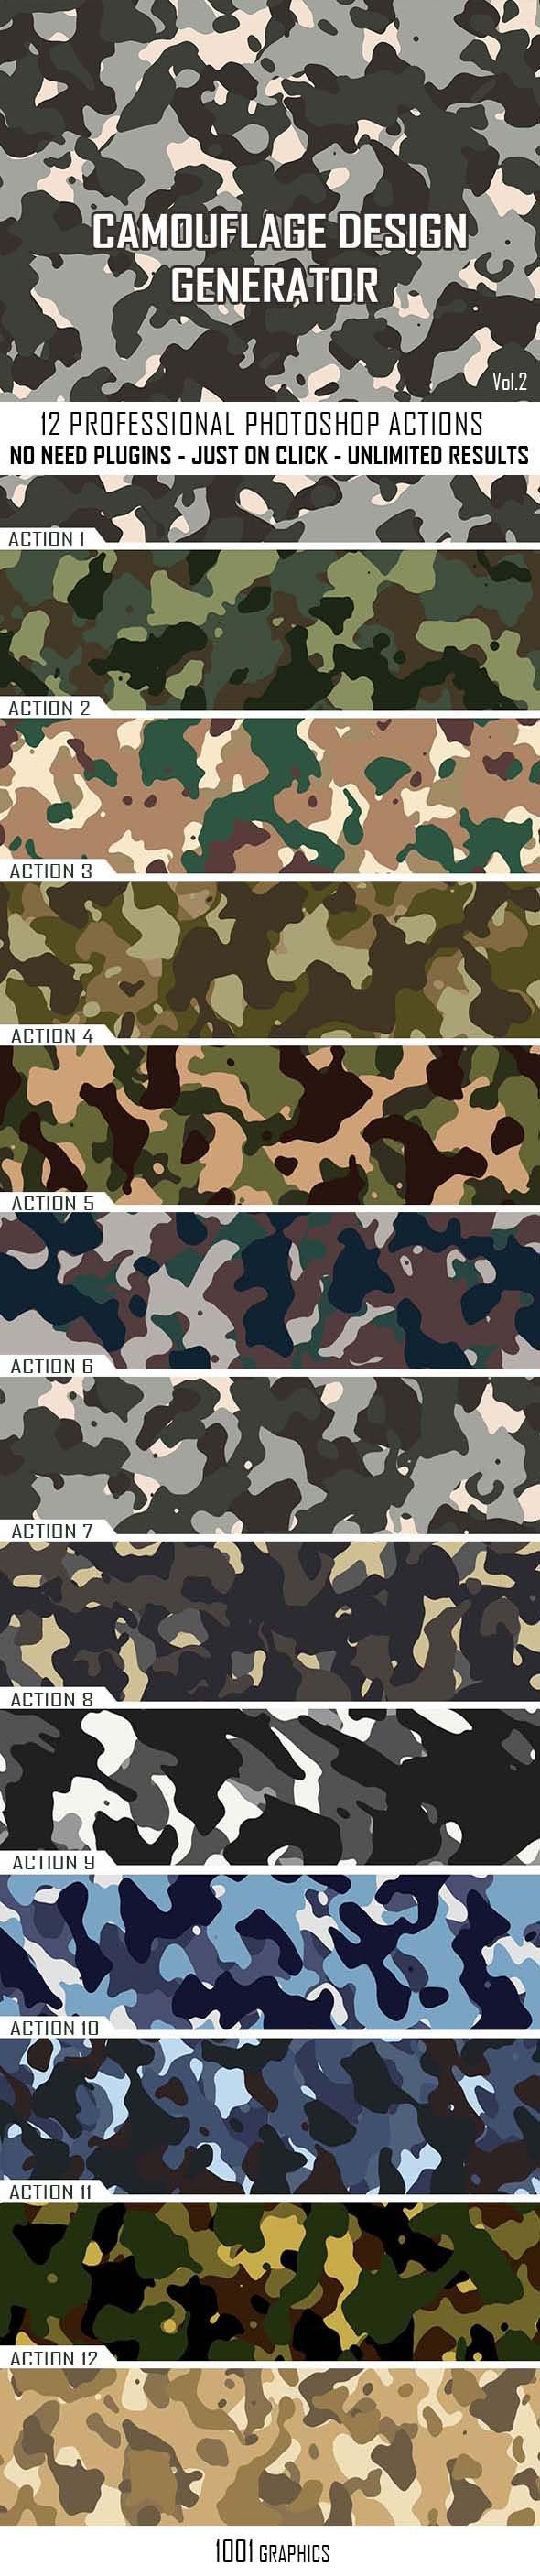 Camouflage Texture Generator - 12 PS Actions Vol.2 - Utilities Actions